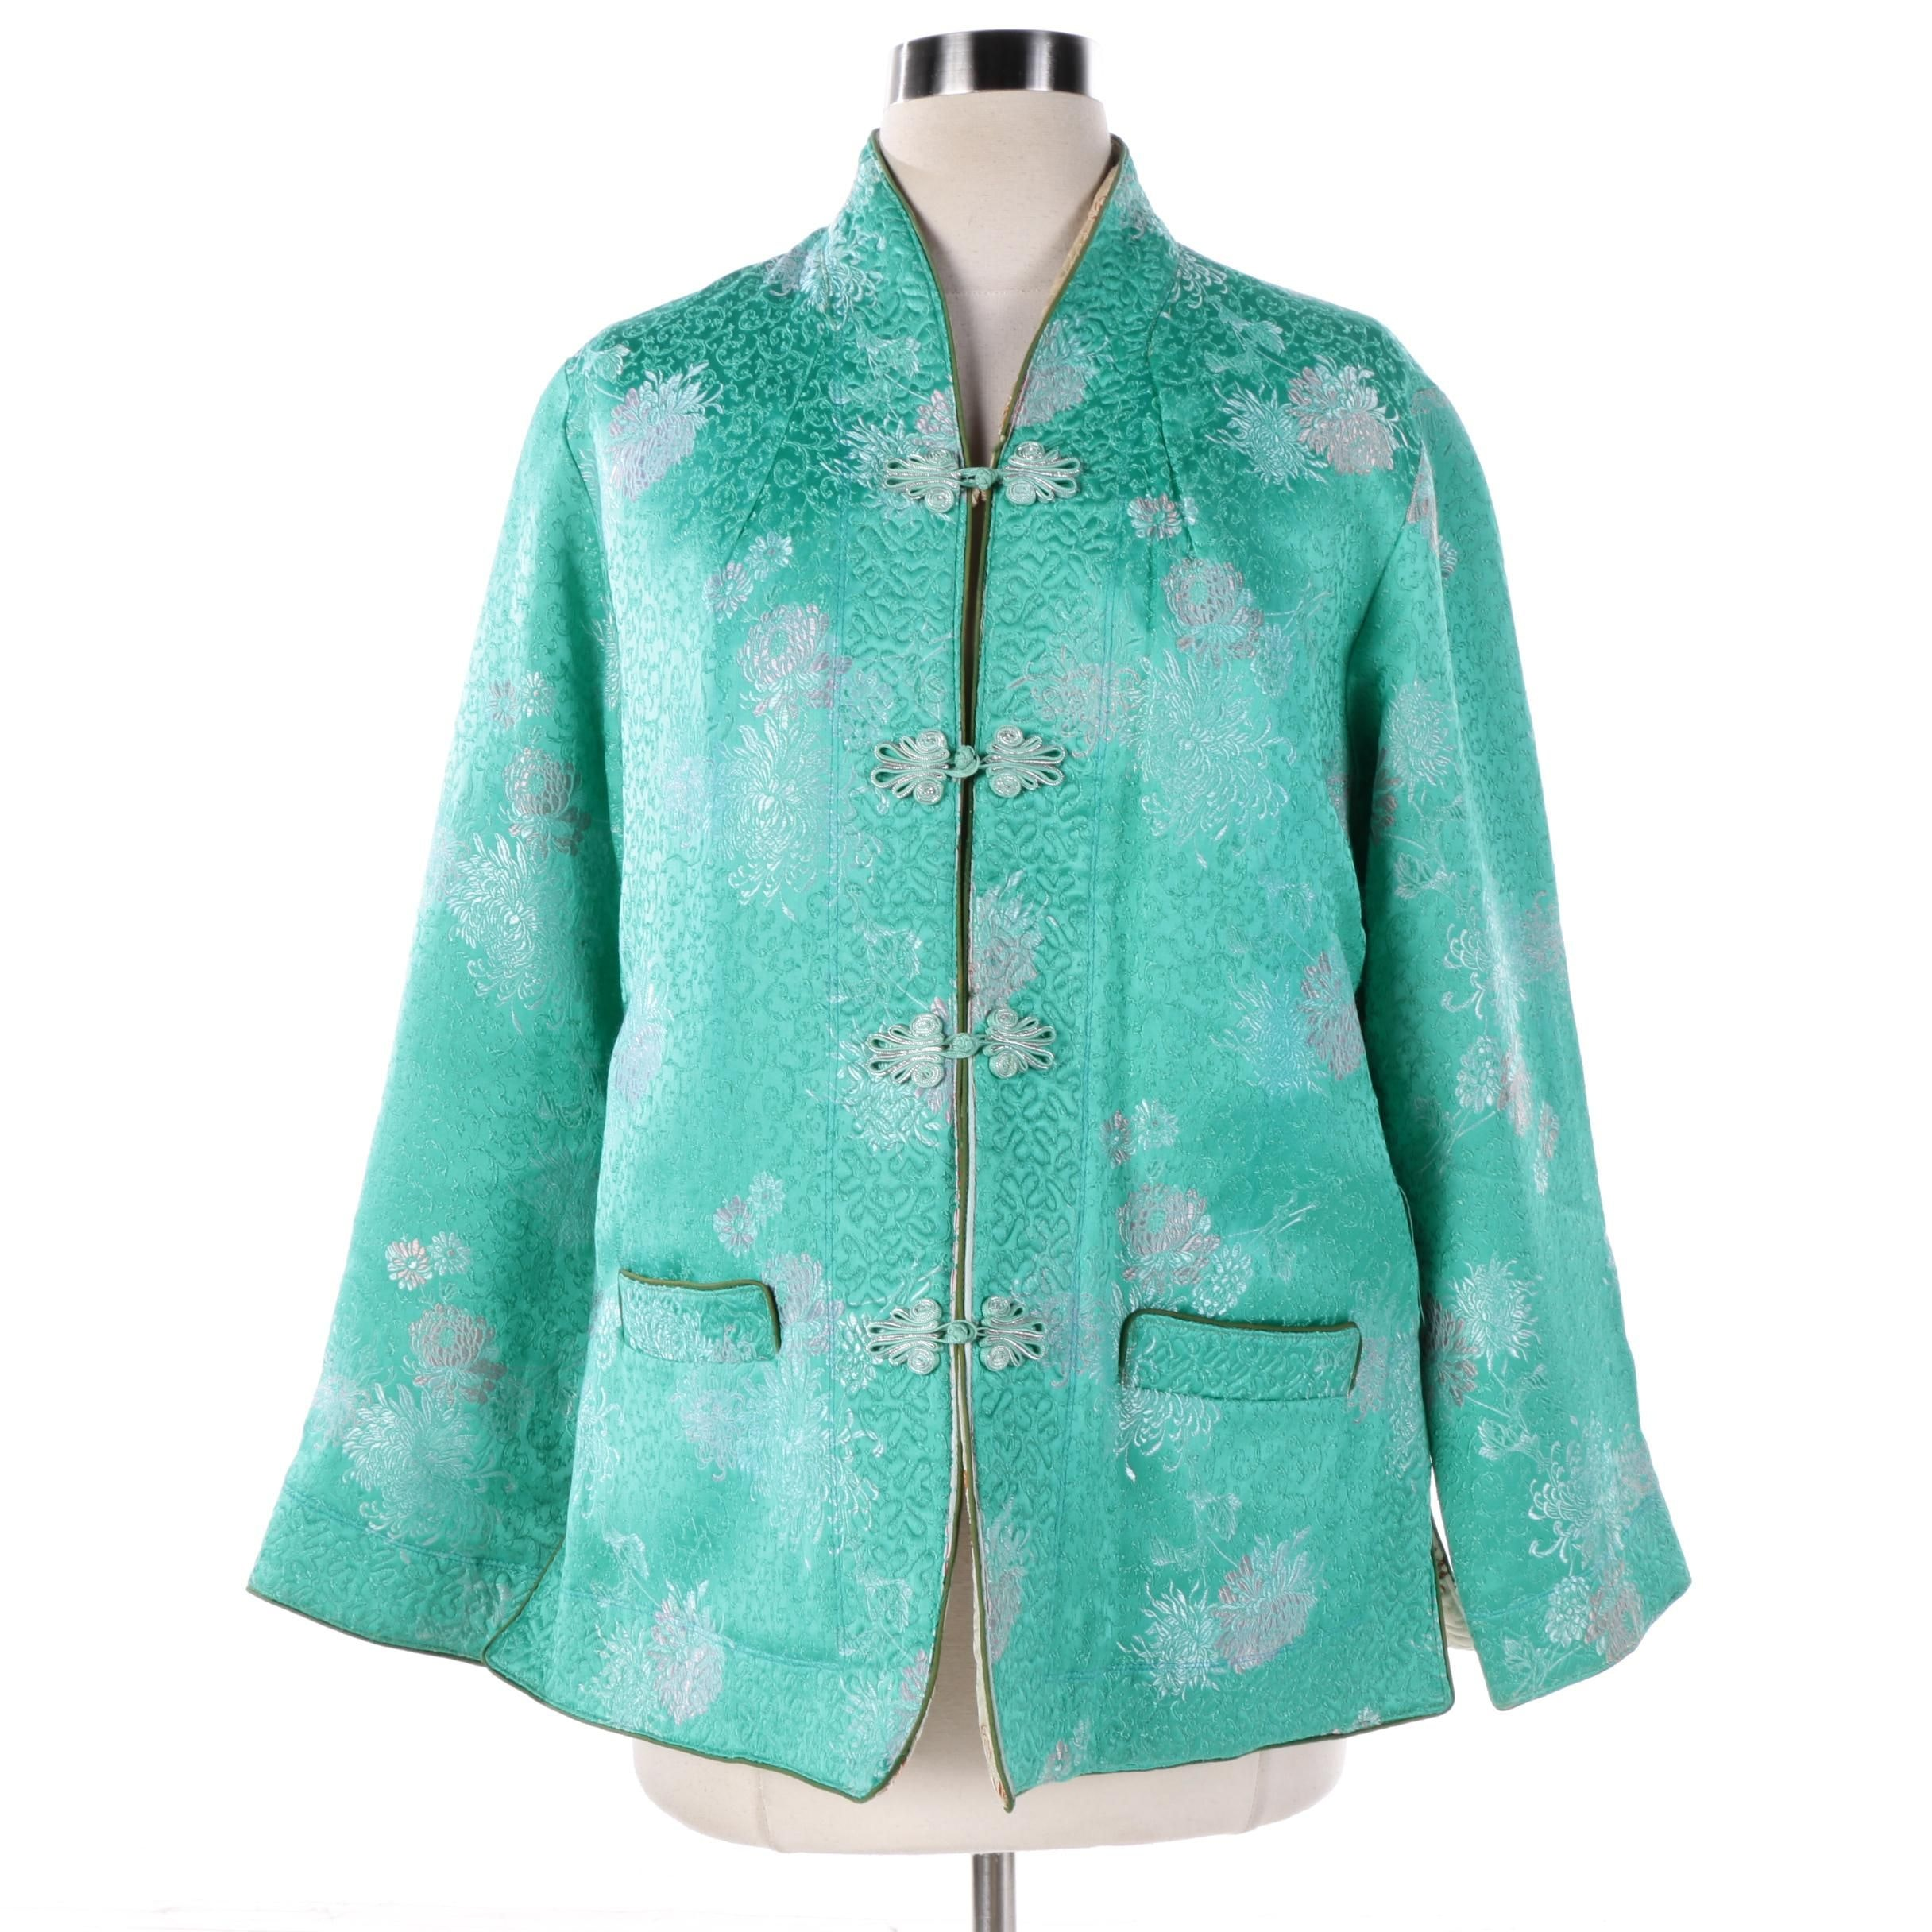 Women's Chinese Inspired Reversible Brocade Silk Jacket